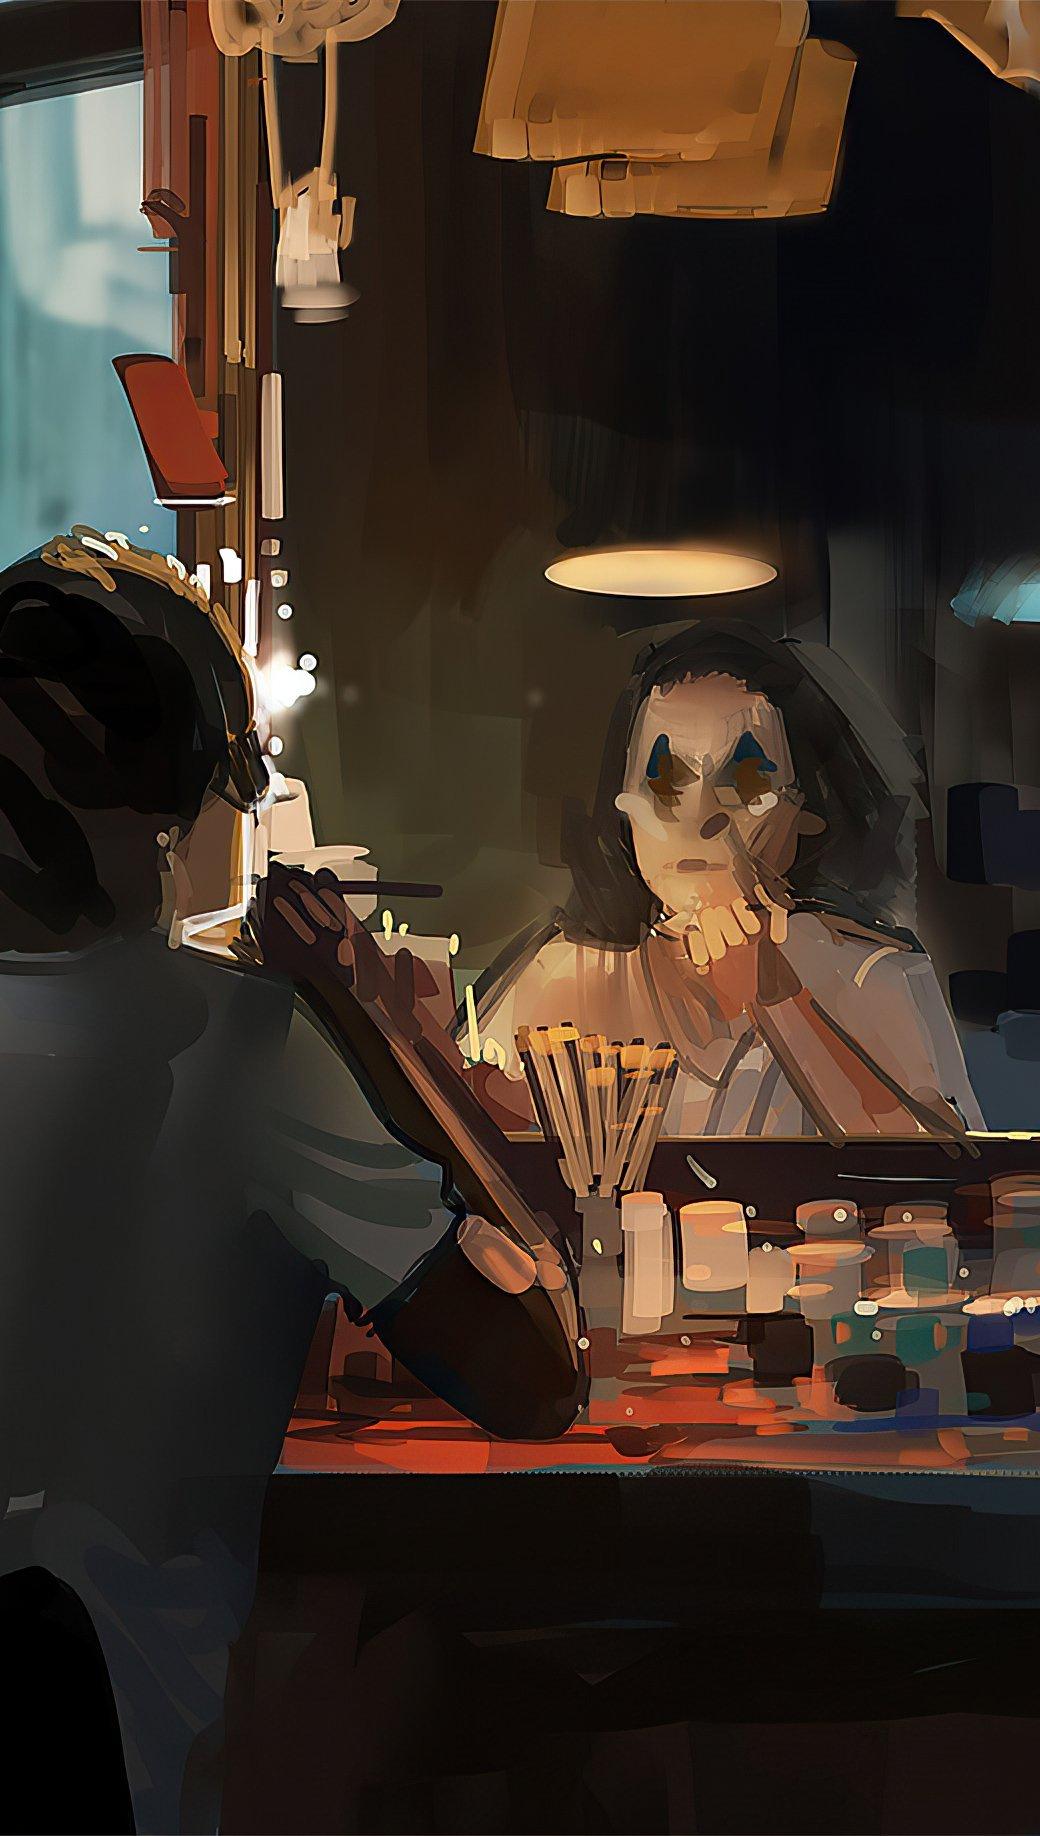 Fondos de pantalla El Guasón maquillandose Artwork Vertical